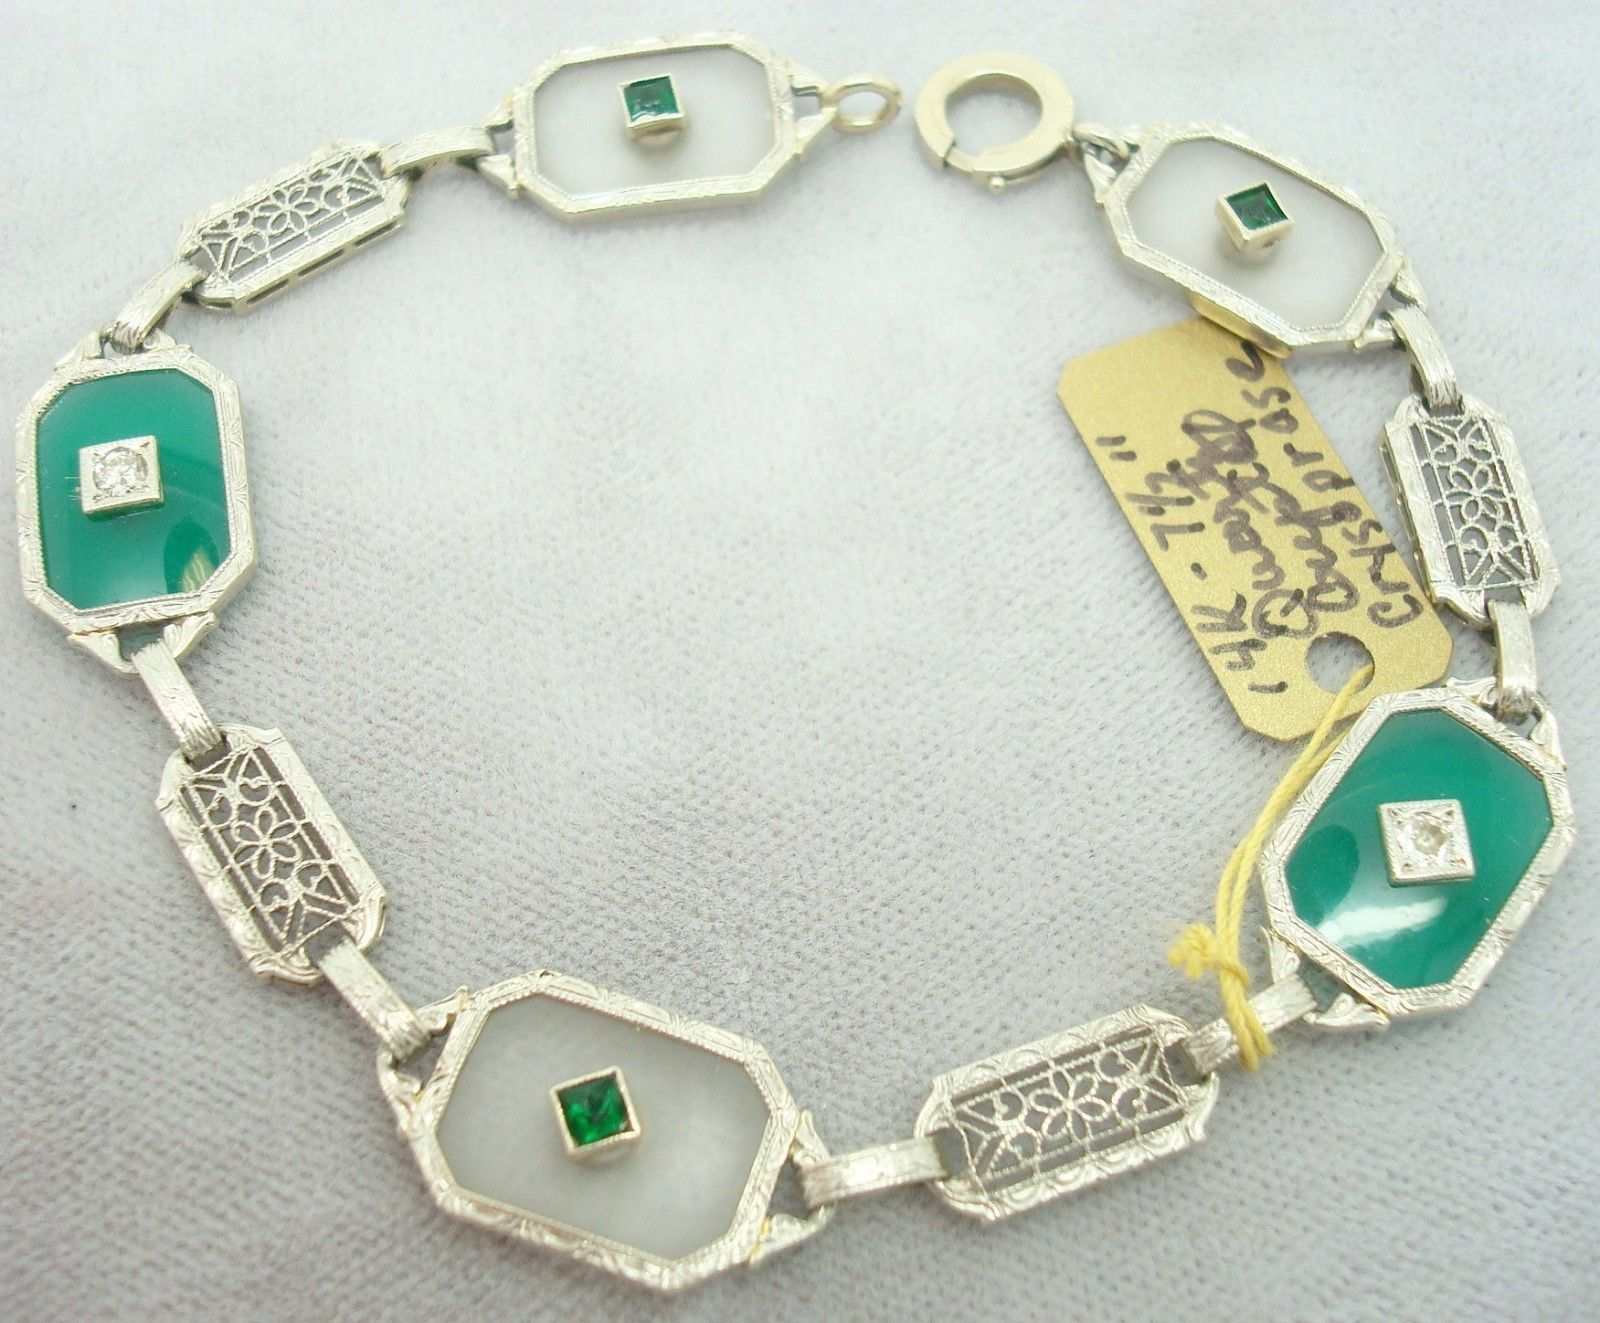 14K Gold Crystal Quartz Filigree Bracelet with Chrysoprase (#J1727)